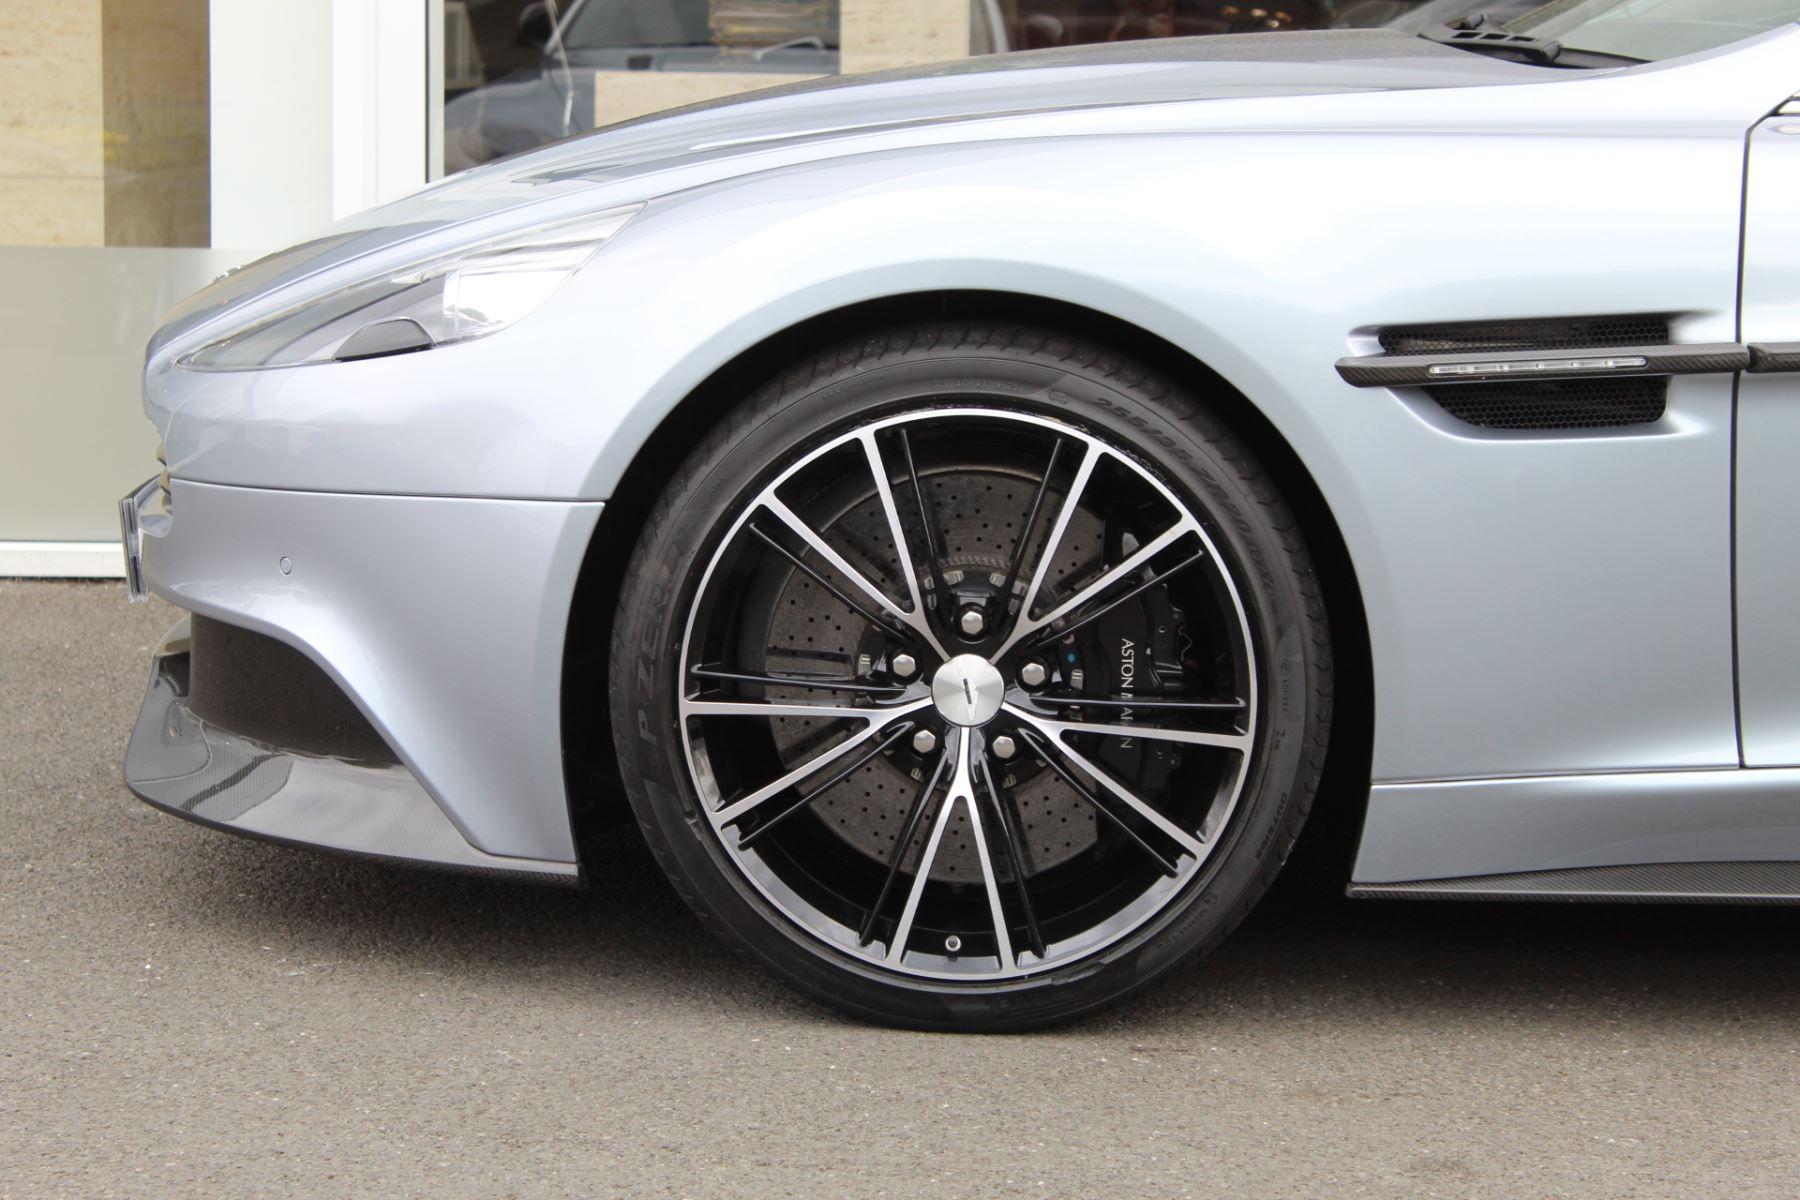 Aston Martin Vanquish V12 2+2 2dr Touchtronic image 20